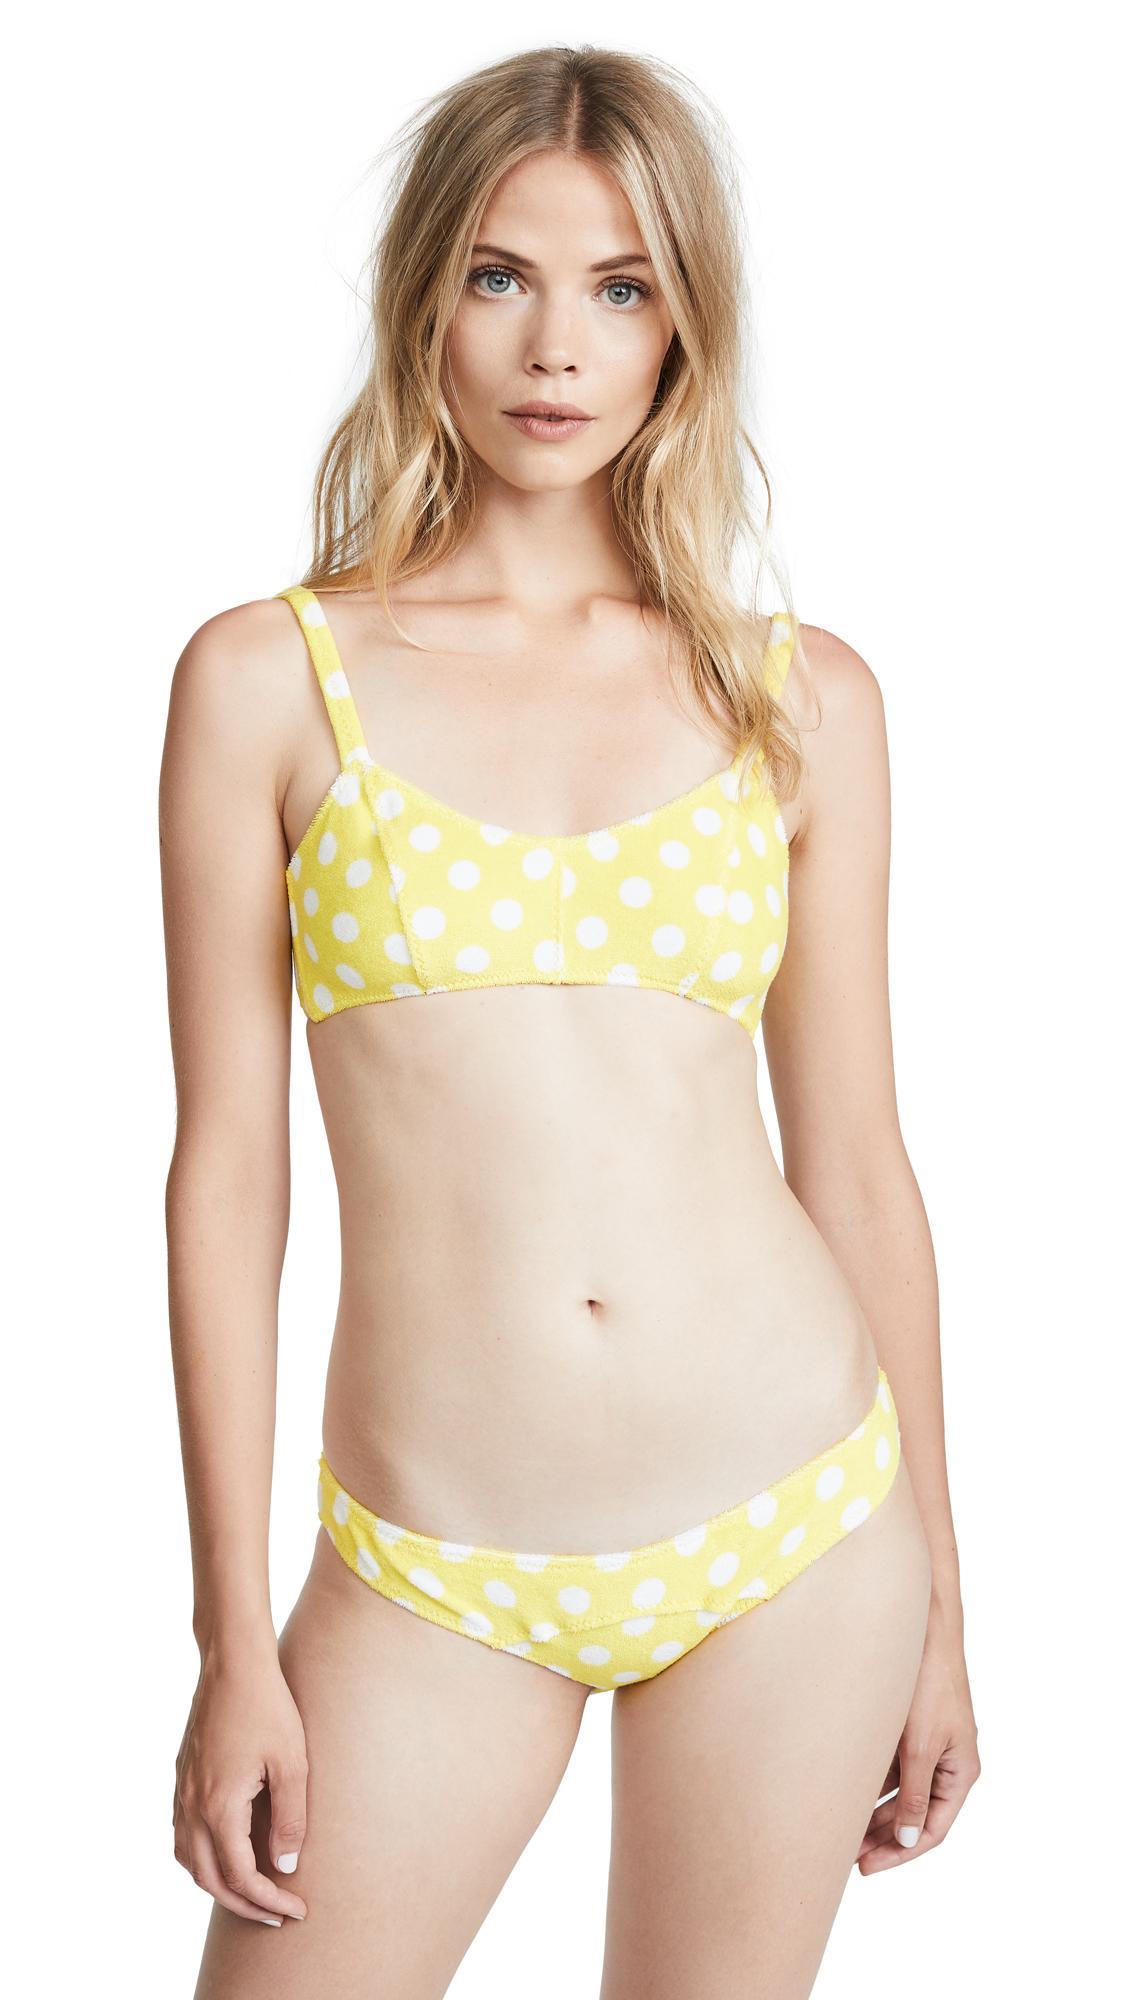 d888088b160bc Lisa Marie Fernandez Genevieve Terry Bikini In Yellow Terry With Polka Dots